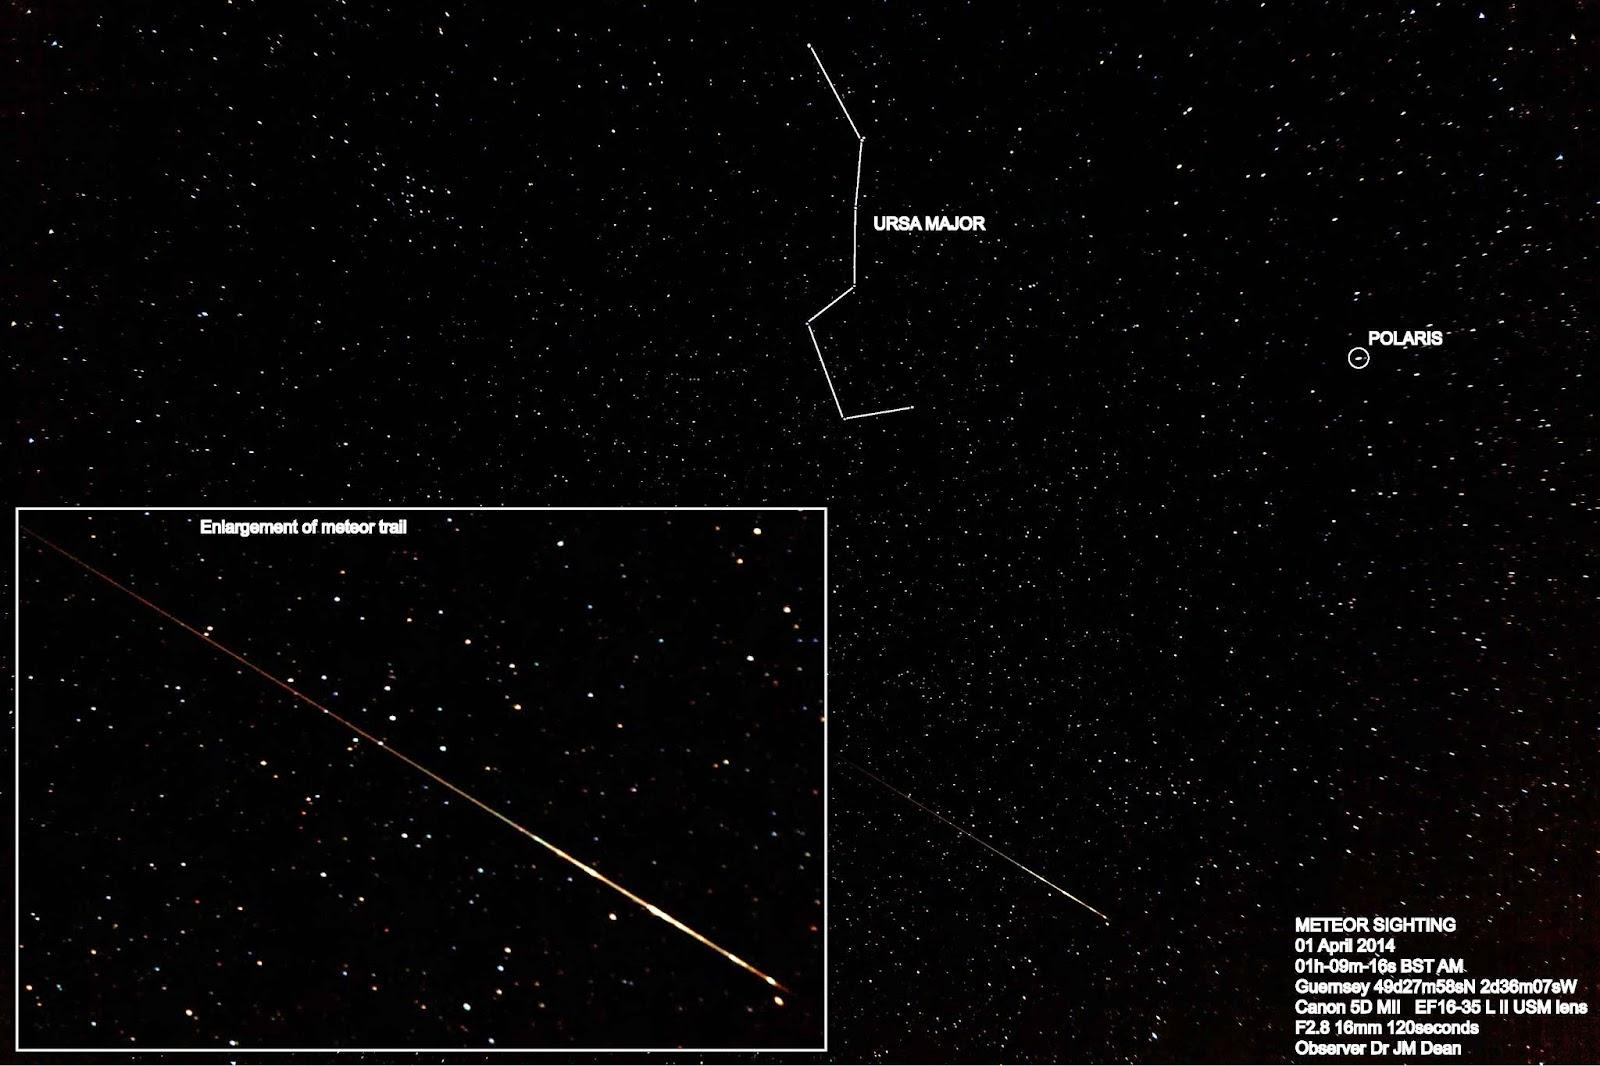 The Latest Worldwide Meteor/Meteorite News: Guernsey, UK